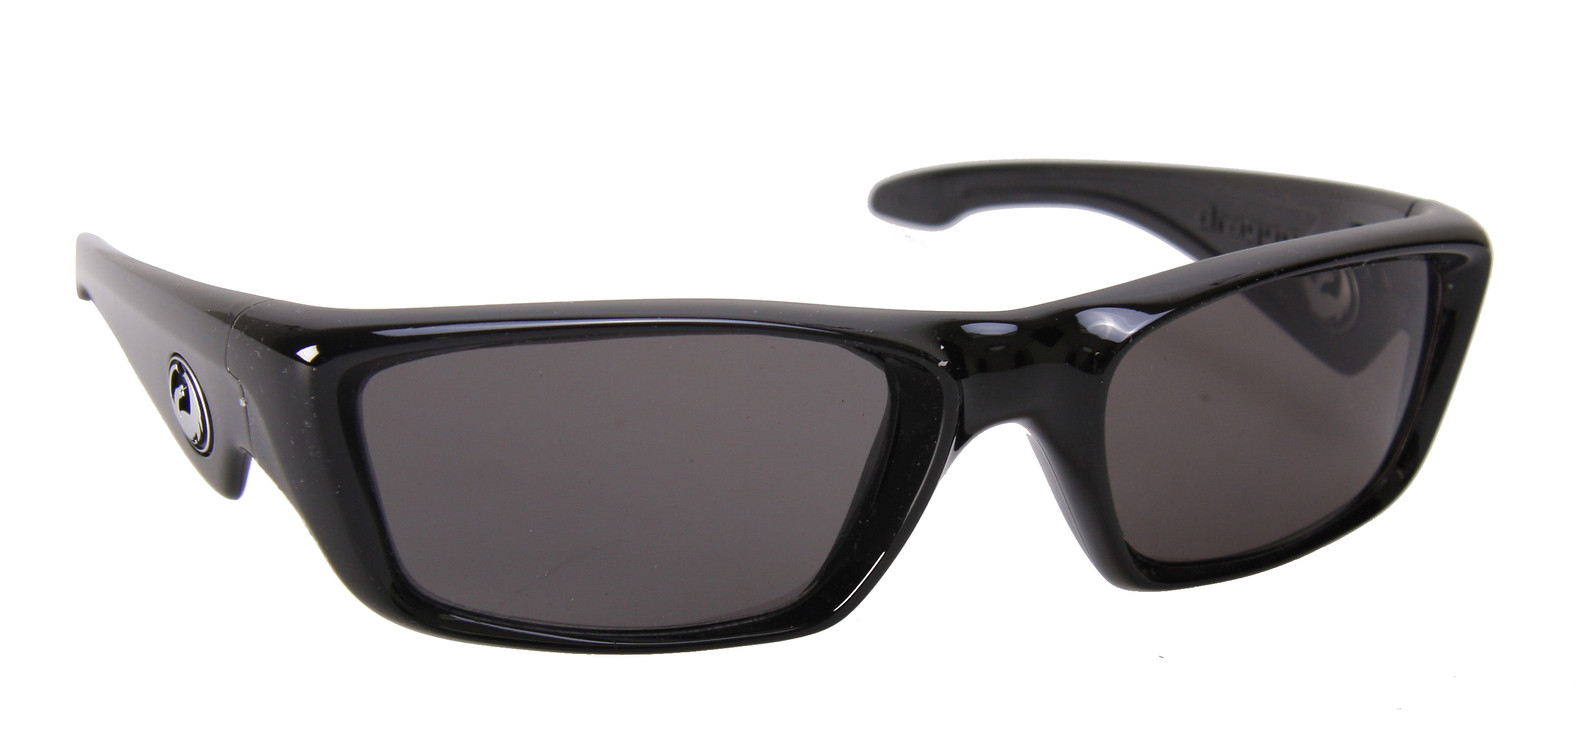 Dragon Rev Sunglasses Jet/Grey Lens  dragon-rev-sngls-jetgry-09.jpg